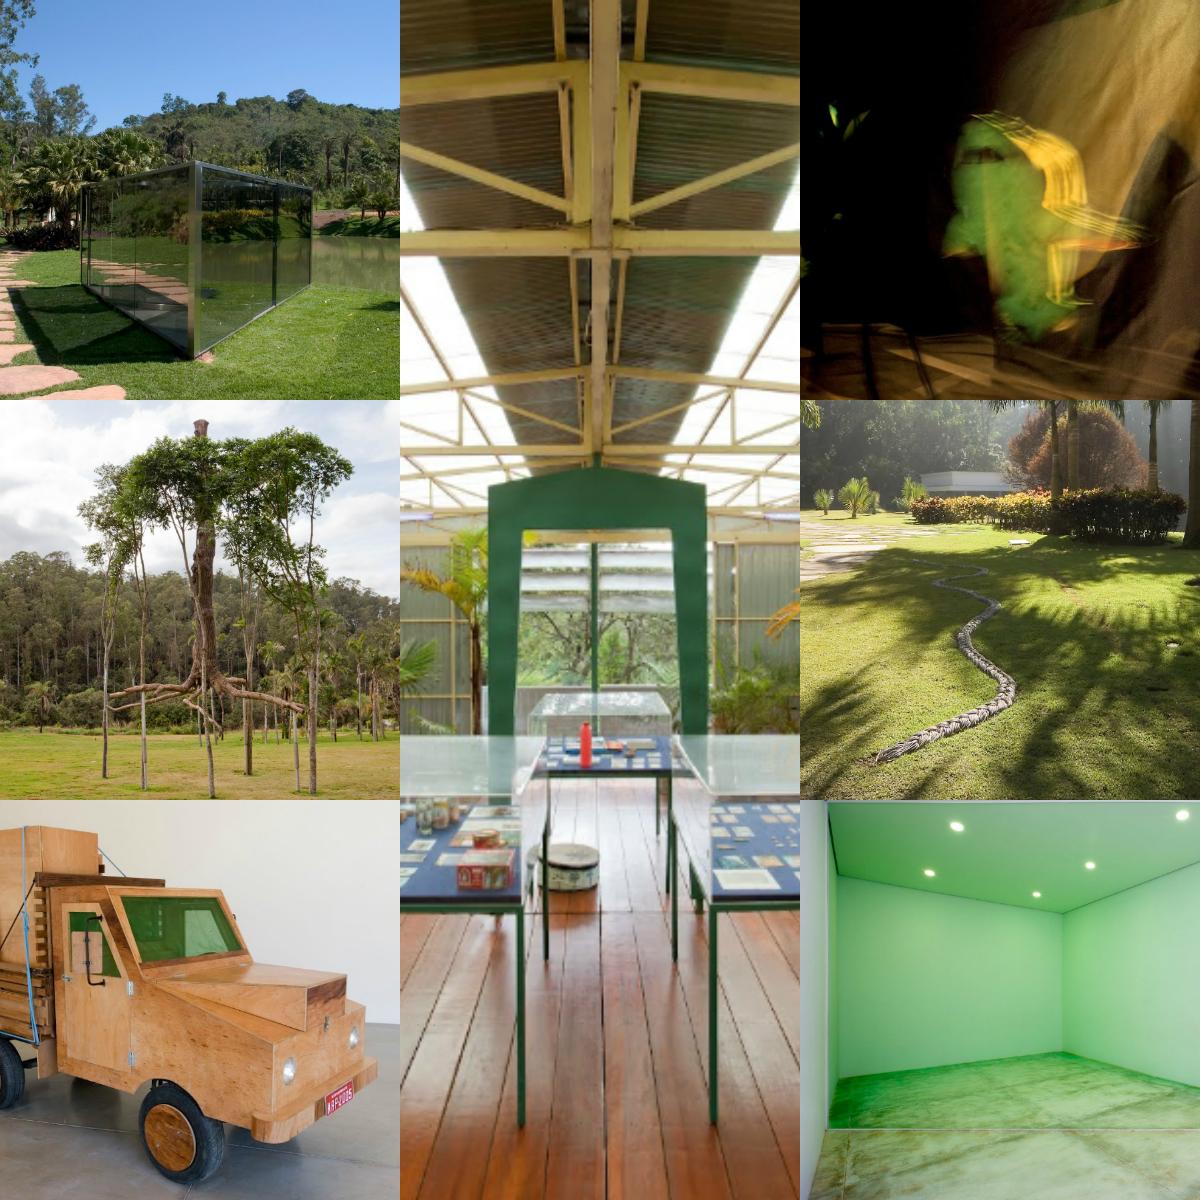 Inhotim-colagem-de-obras-verdes